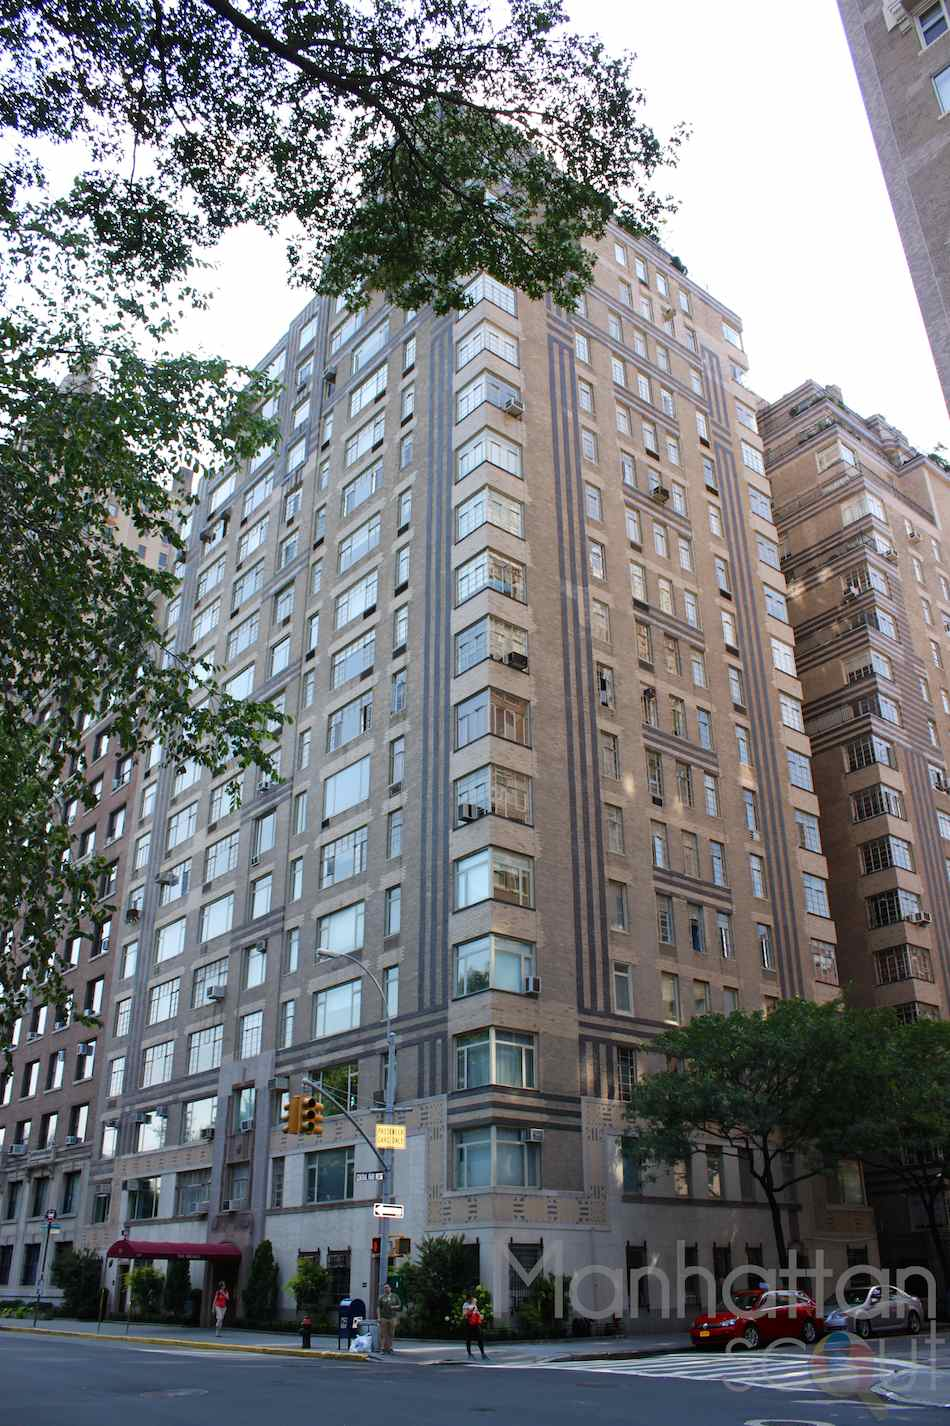 The Ardsley At 320 Central Park West In Upper West Side